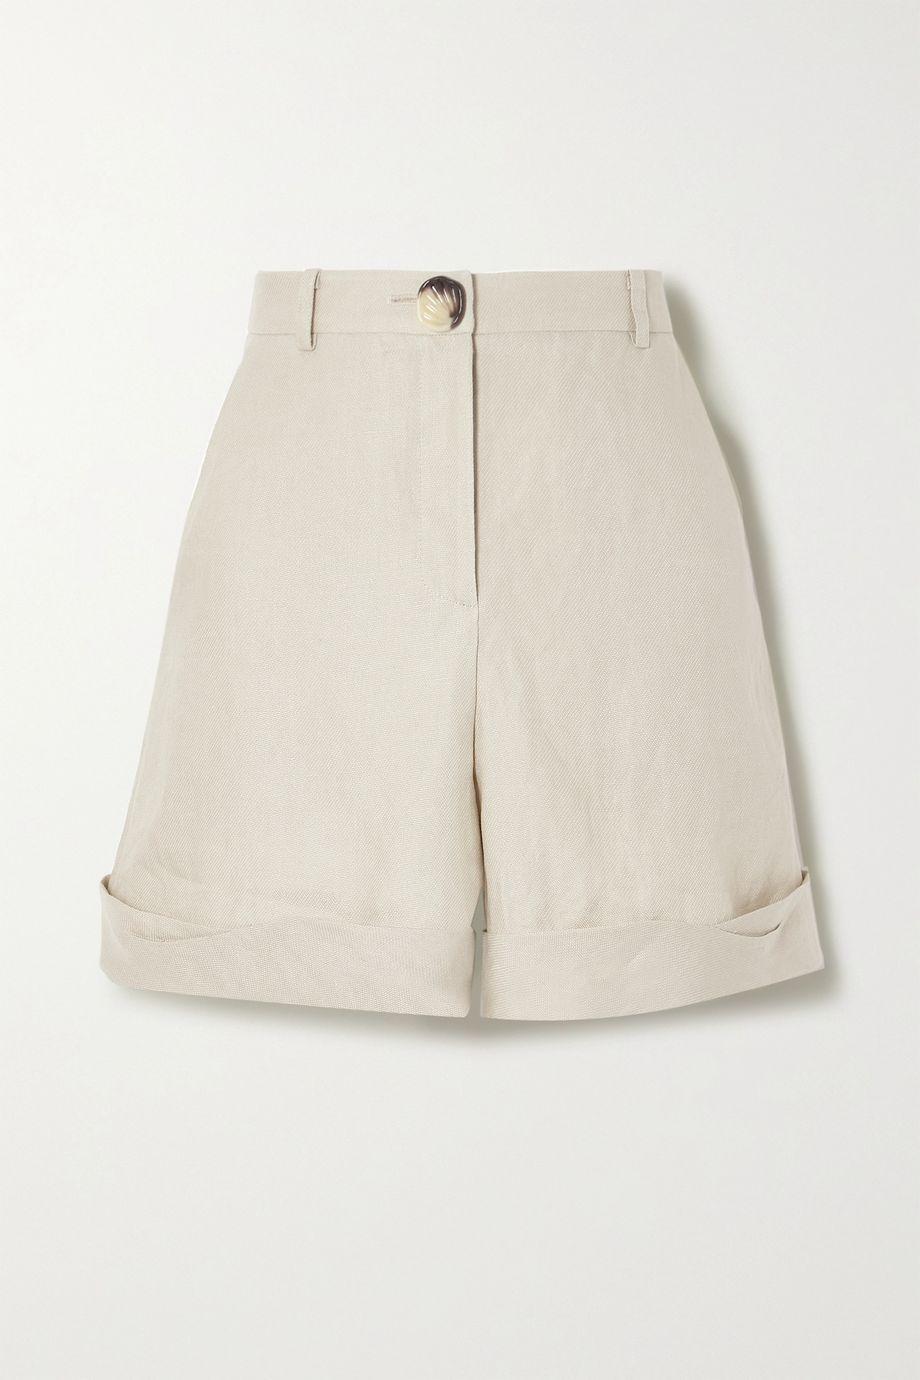 REJINA PYO Oscar linen shorts